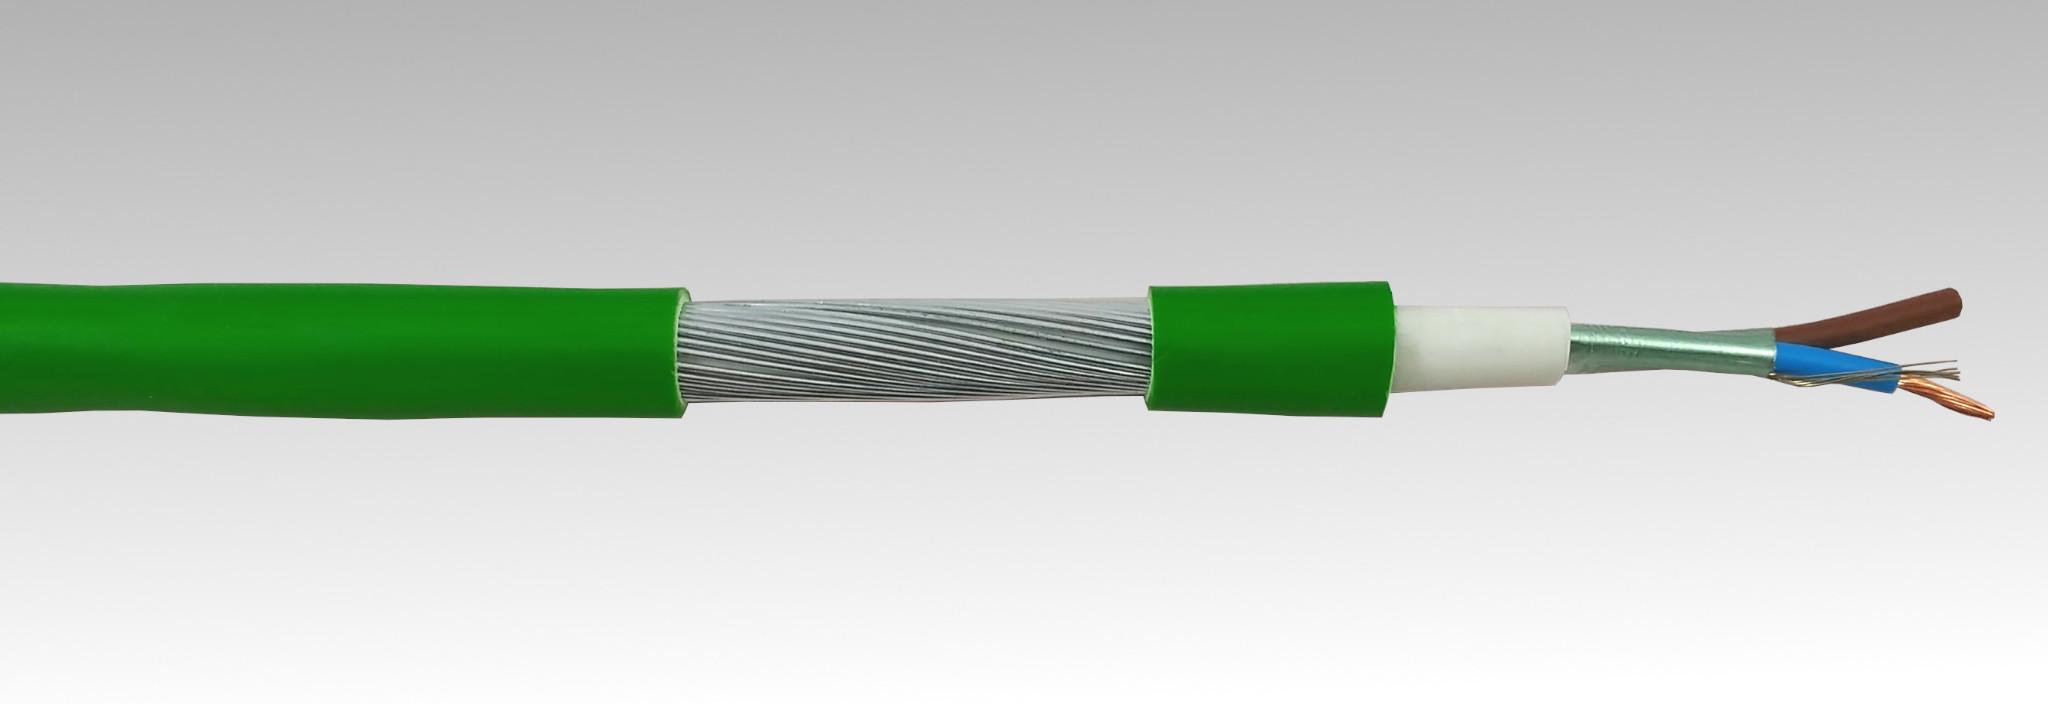 Strange Armoured Cable Cerviflam Roz1Mz1 K As 0 6 1 Kv Cervi Electrical Wiring Cloud Peadfoxcilixyz